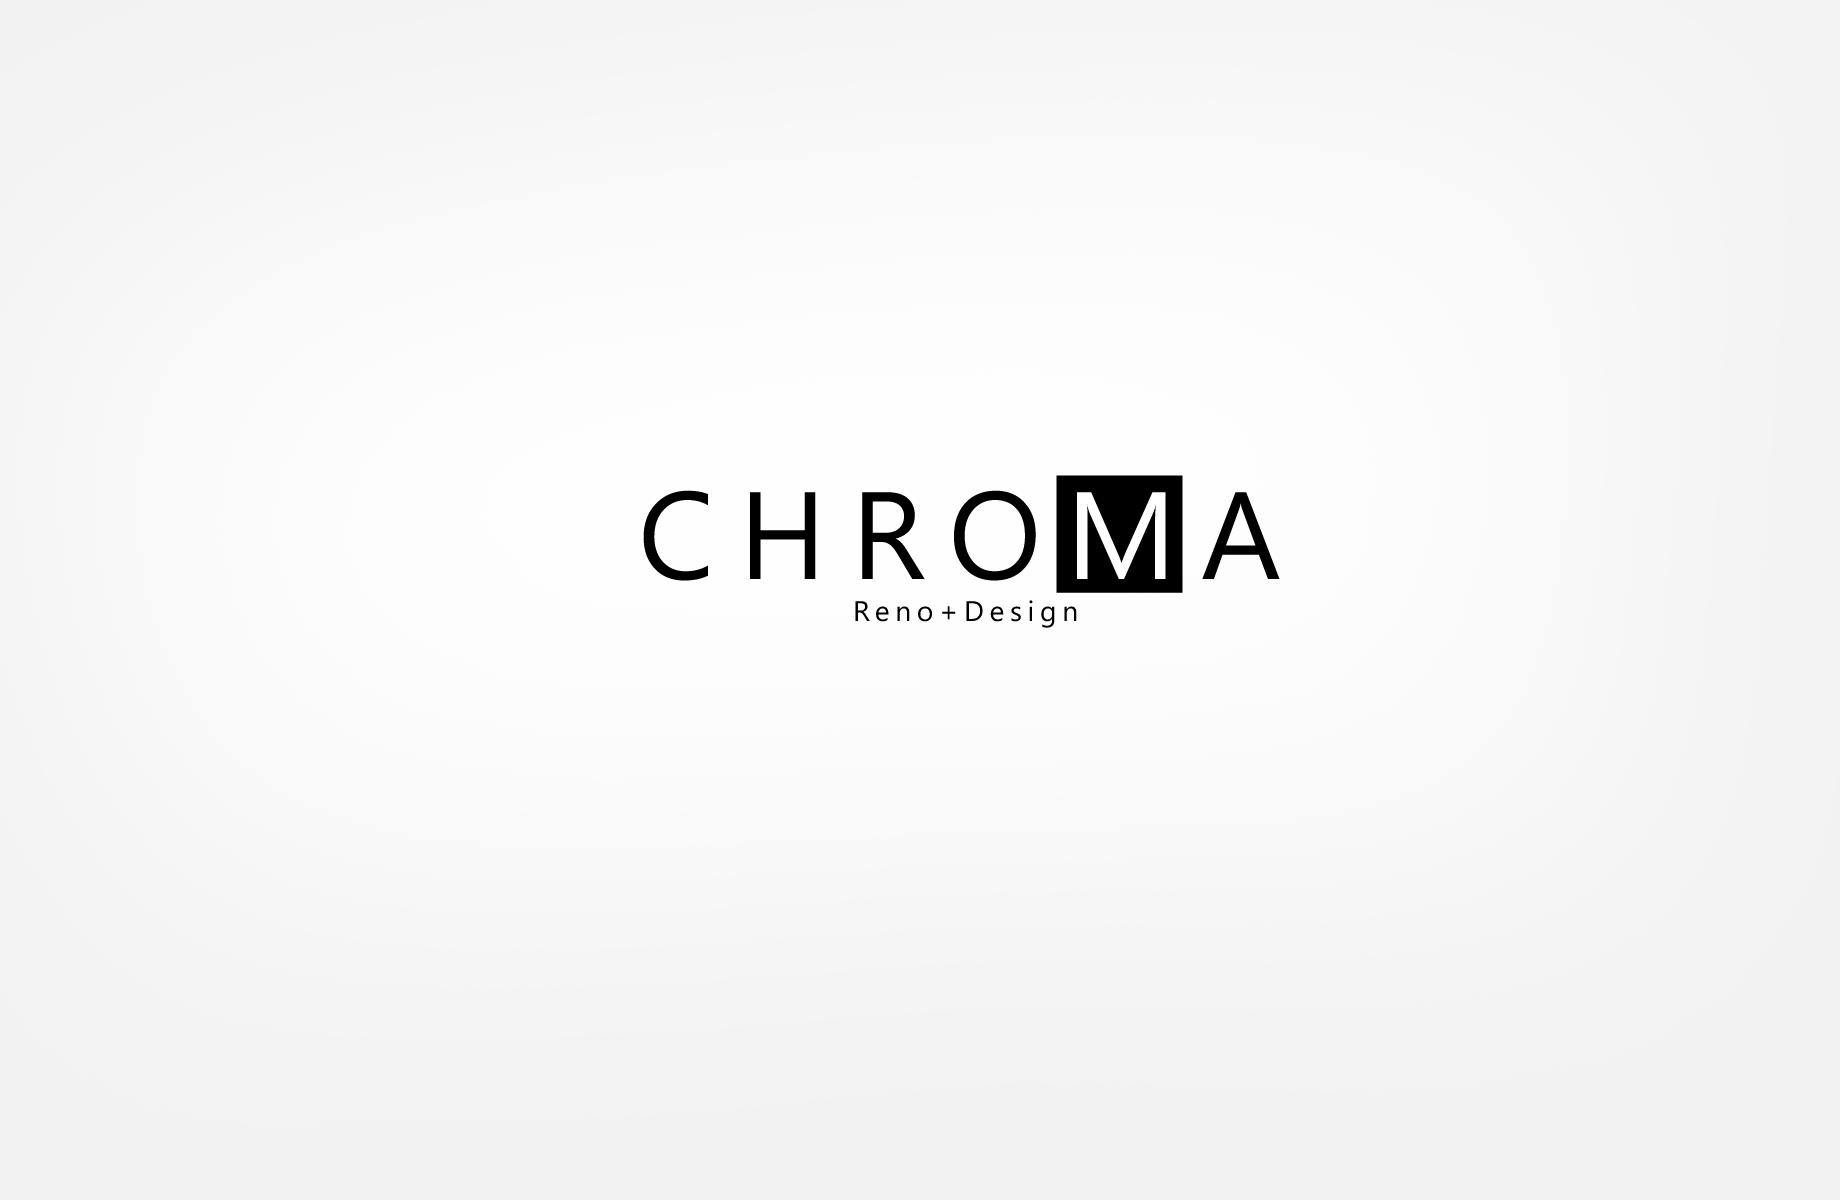 Logo Design by Jan Chua - Entry No. 6 in the Logo Design Contest Inspiring Logo Design for Chroma Reno+Design.